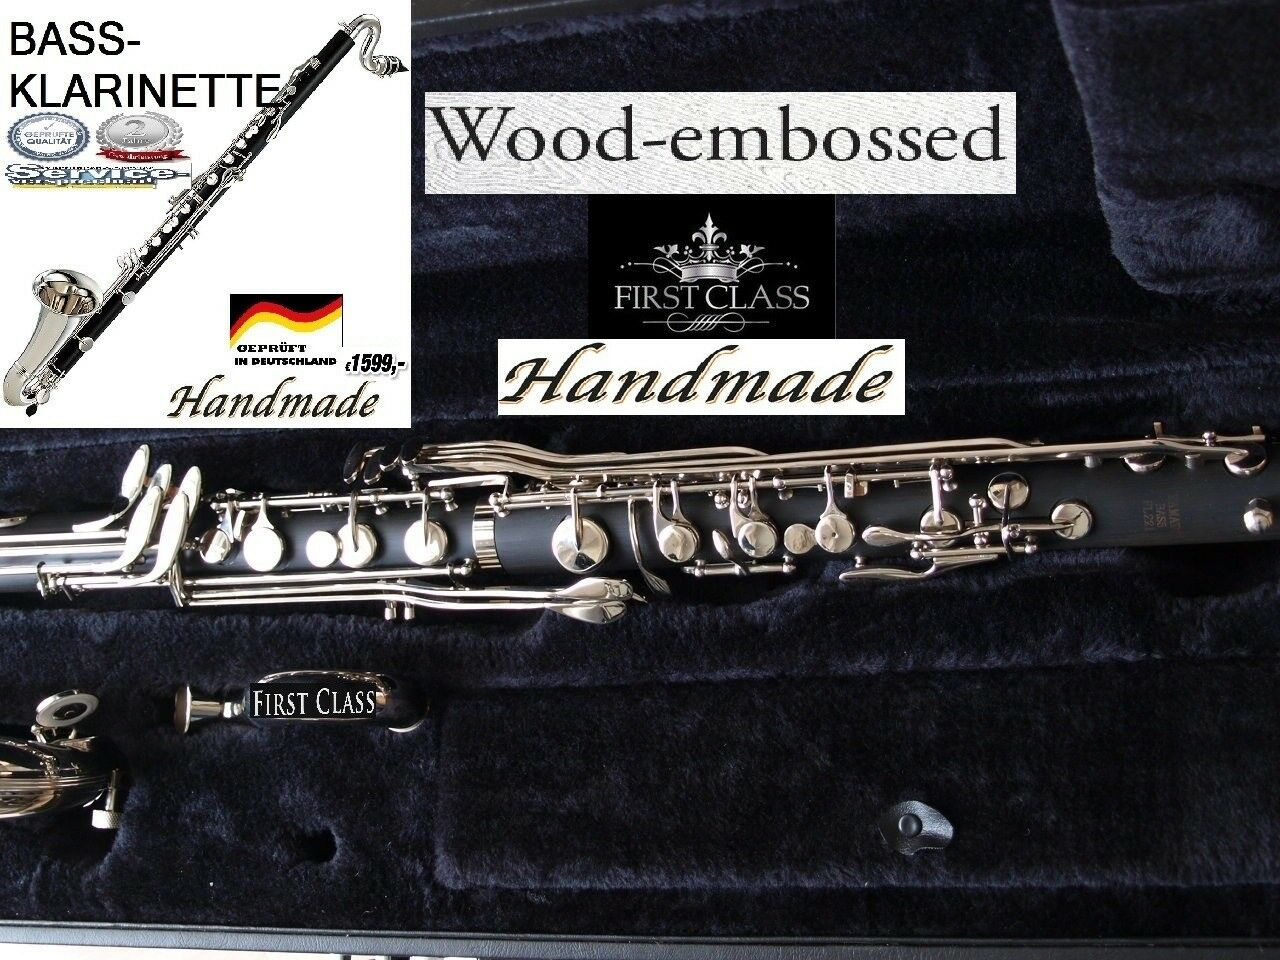 YAMA. Bass-Klarinette Böhm-System Bass Clarinet Clarinetto basso Clarinete bajo